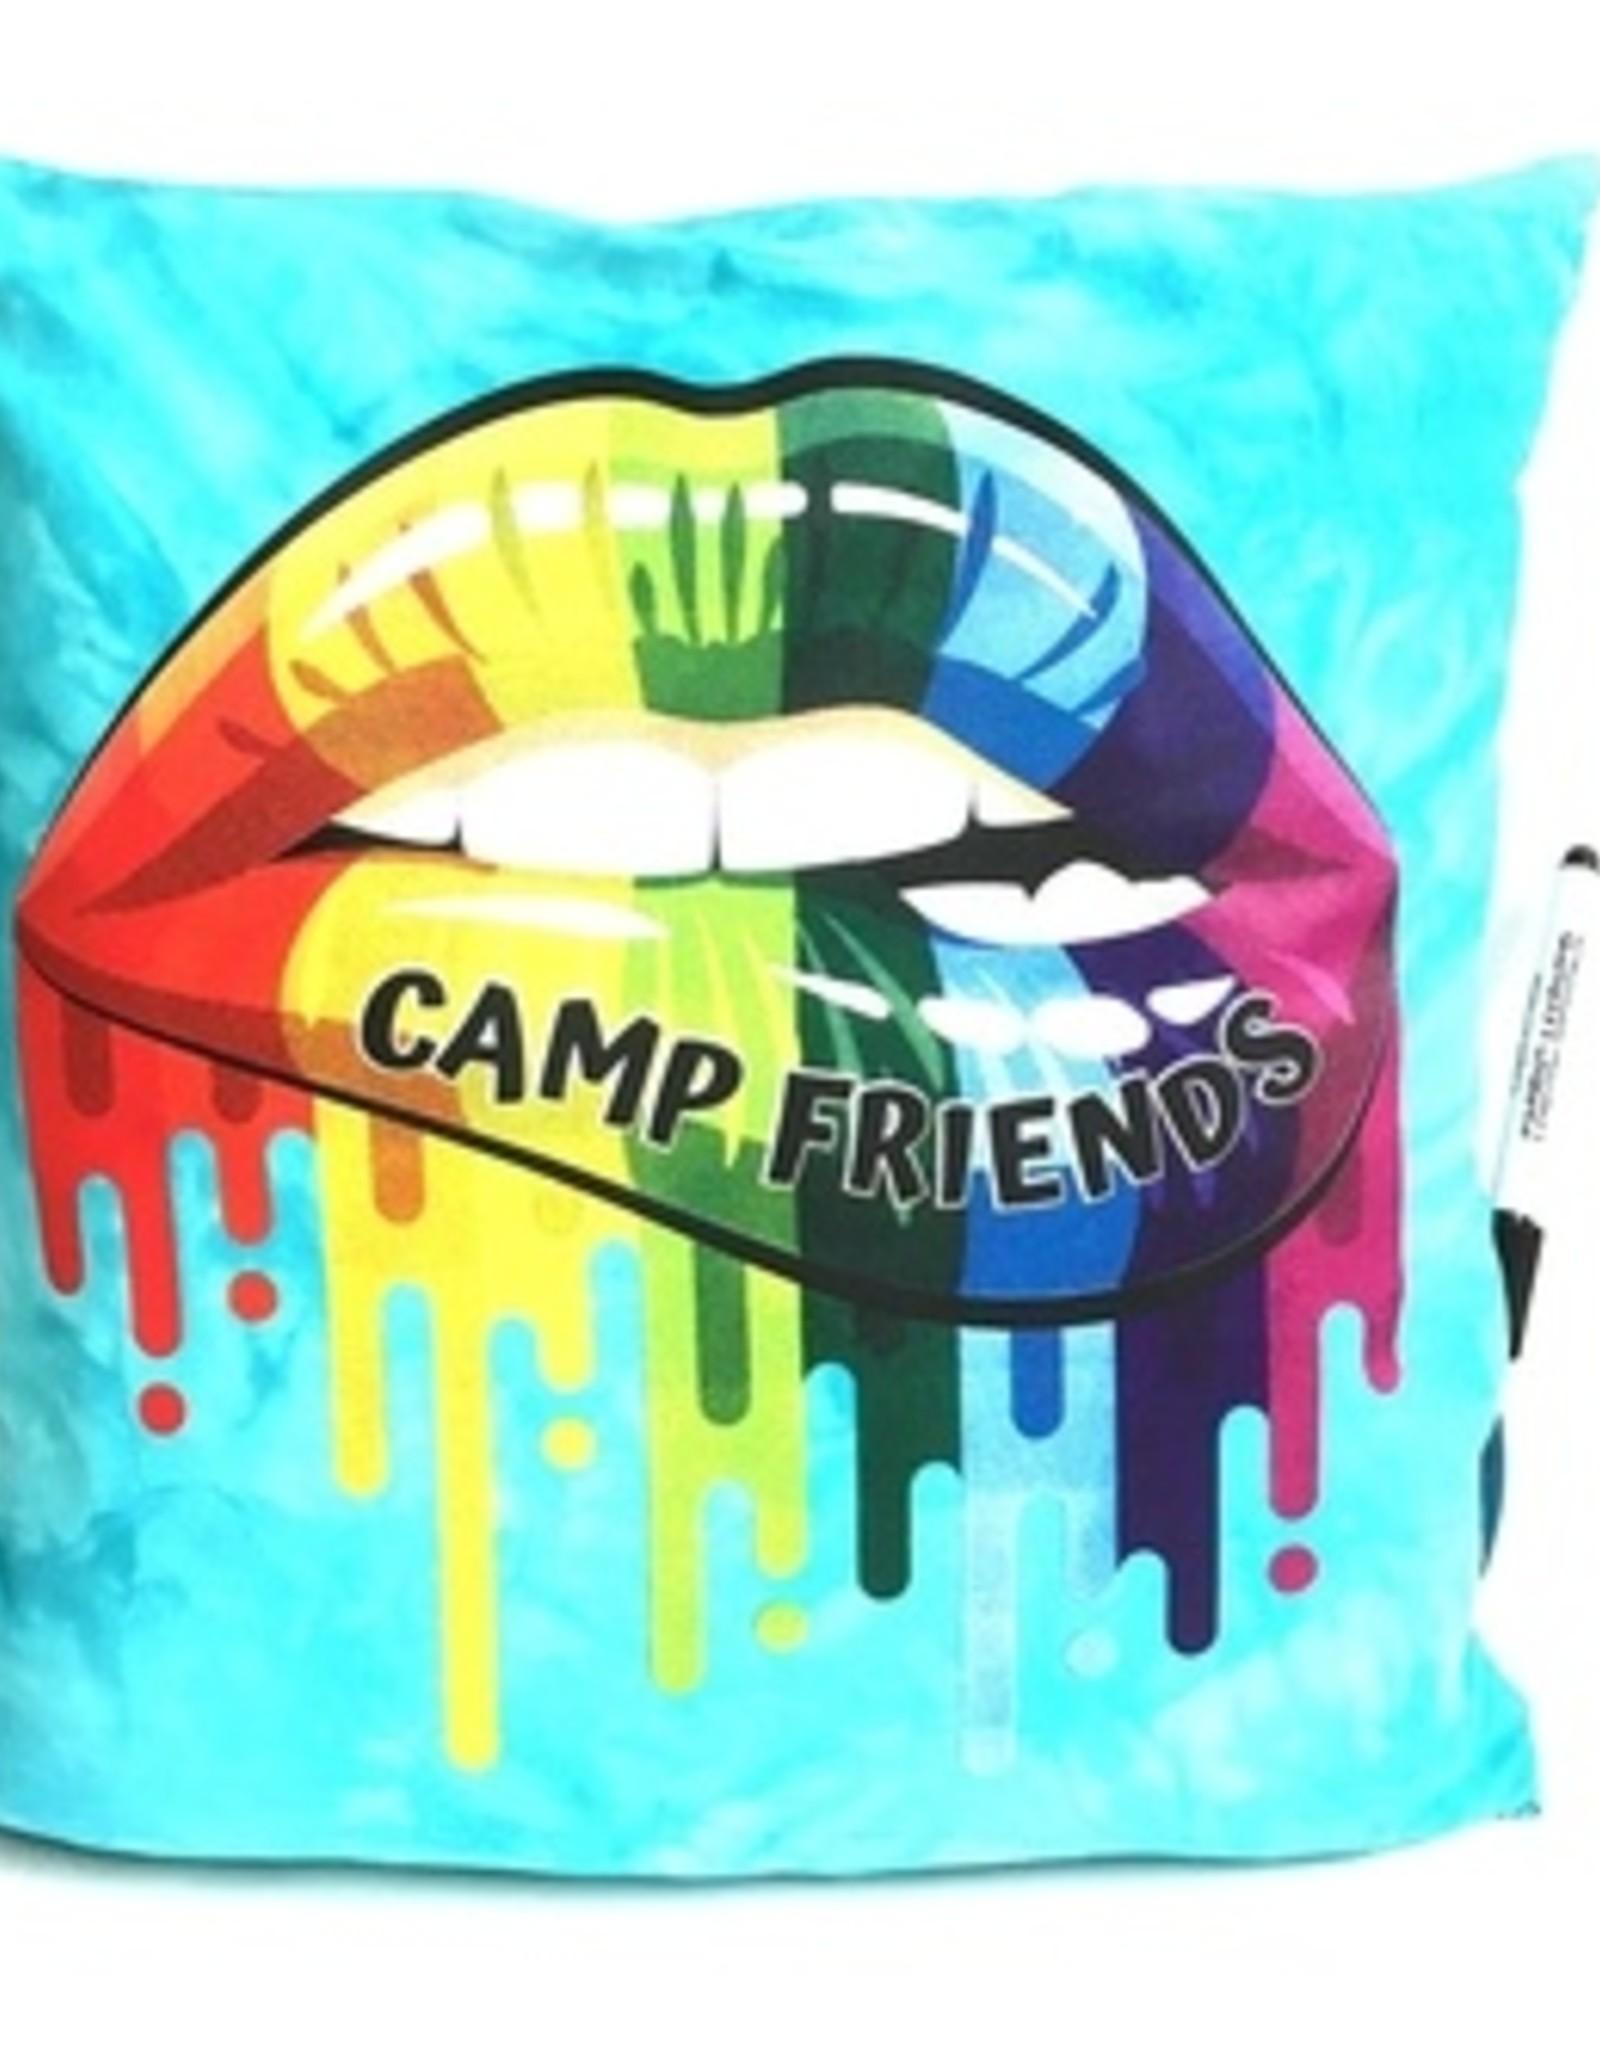 Bunk Junk Bunk Junk Camp Friends Lips Autograph Pillow